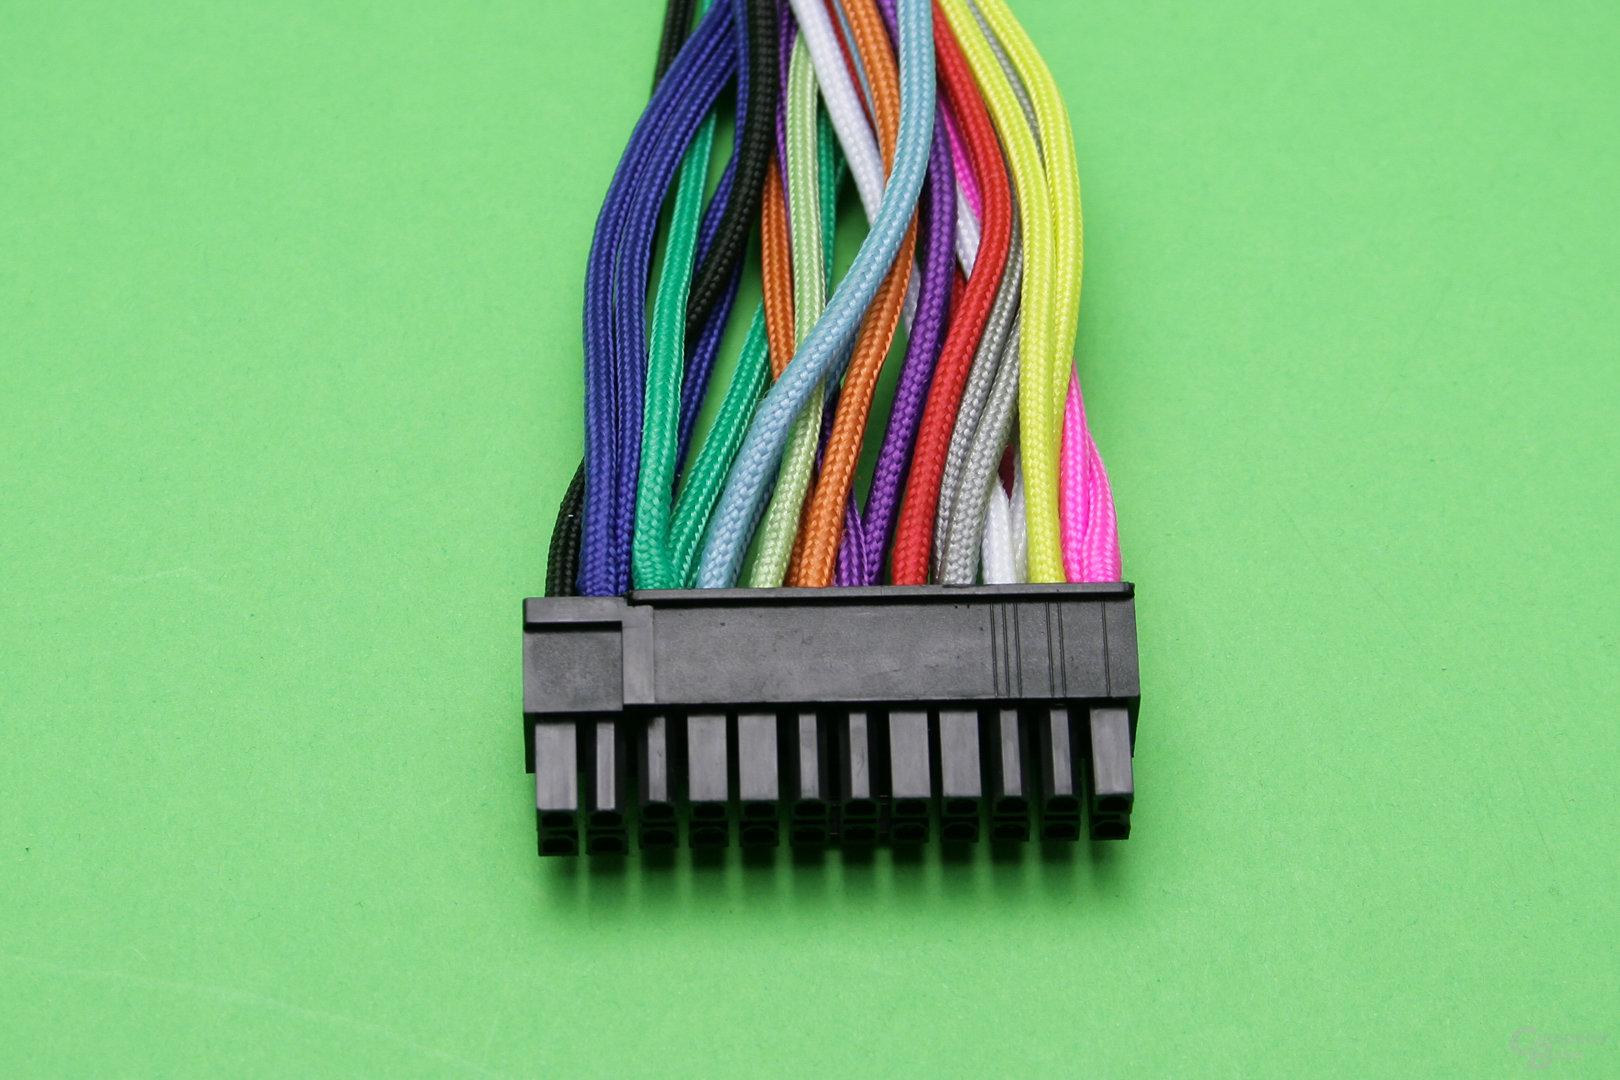 CableMod 24-Pin ATX-Stecker in zwölf Farben